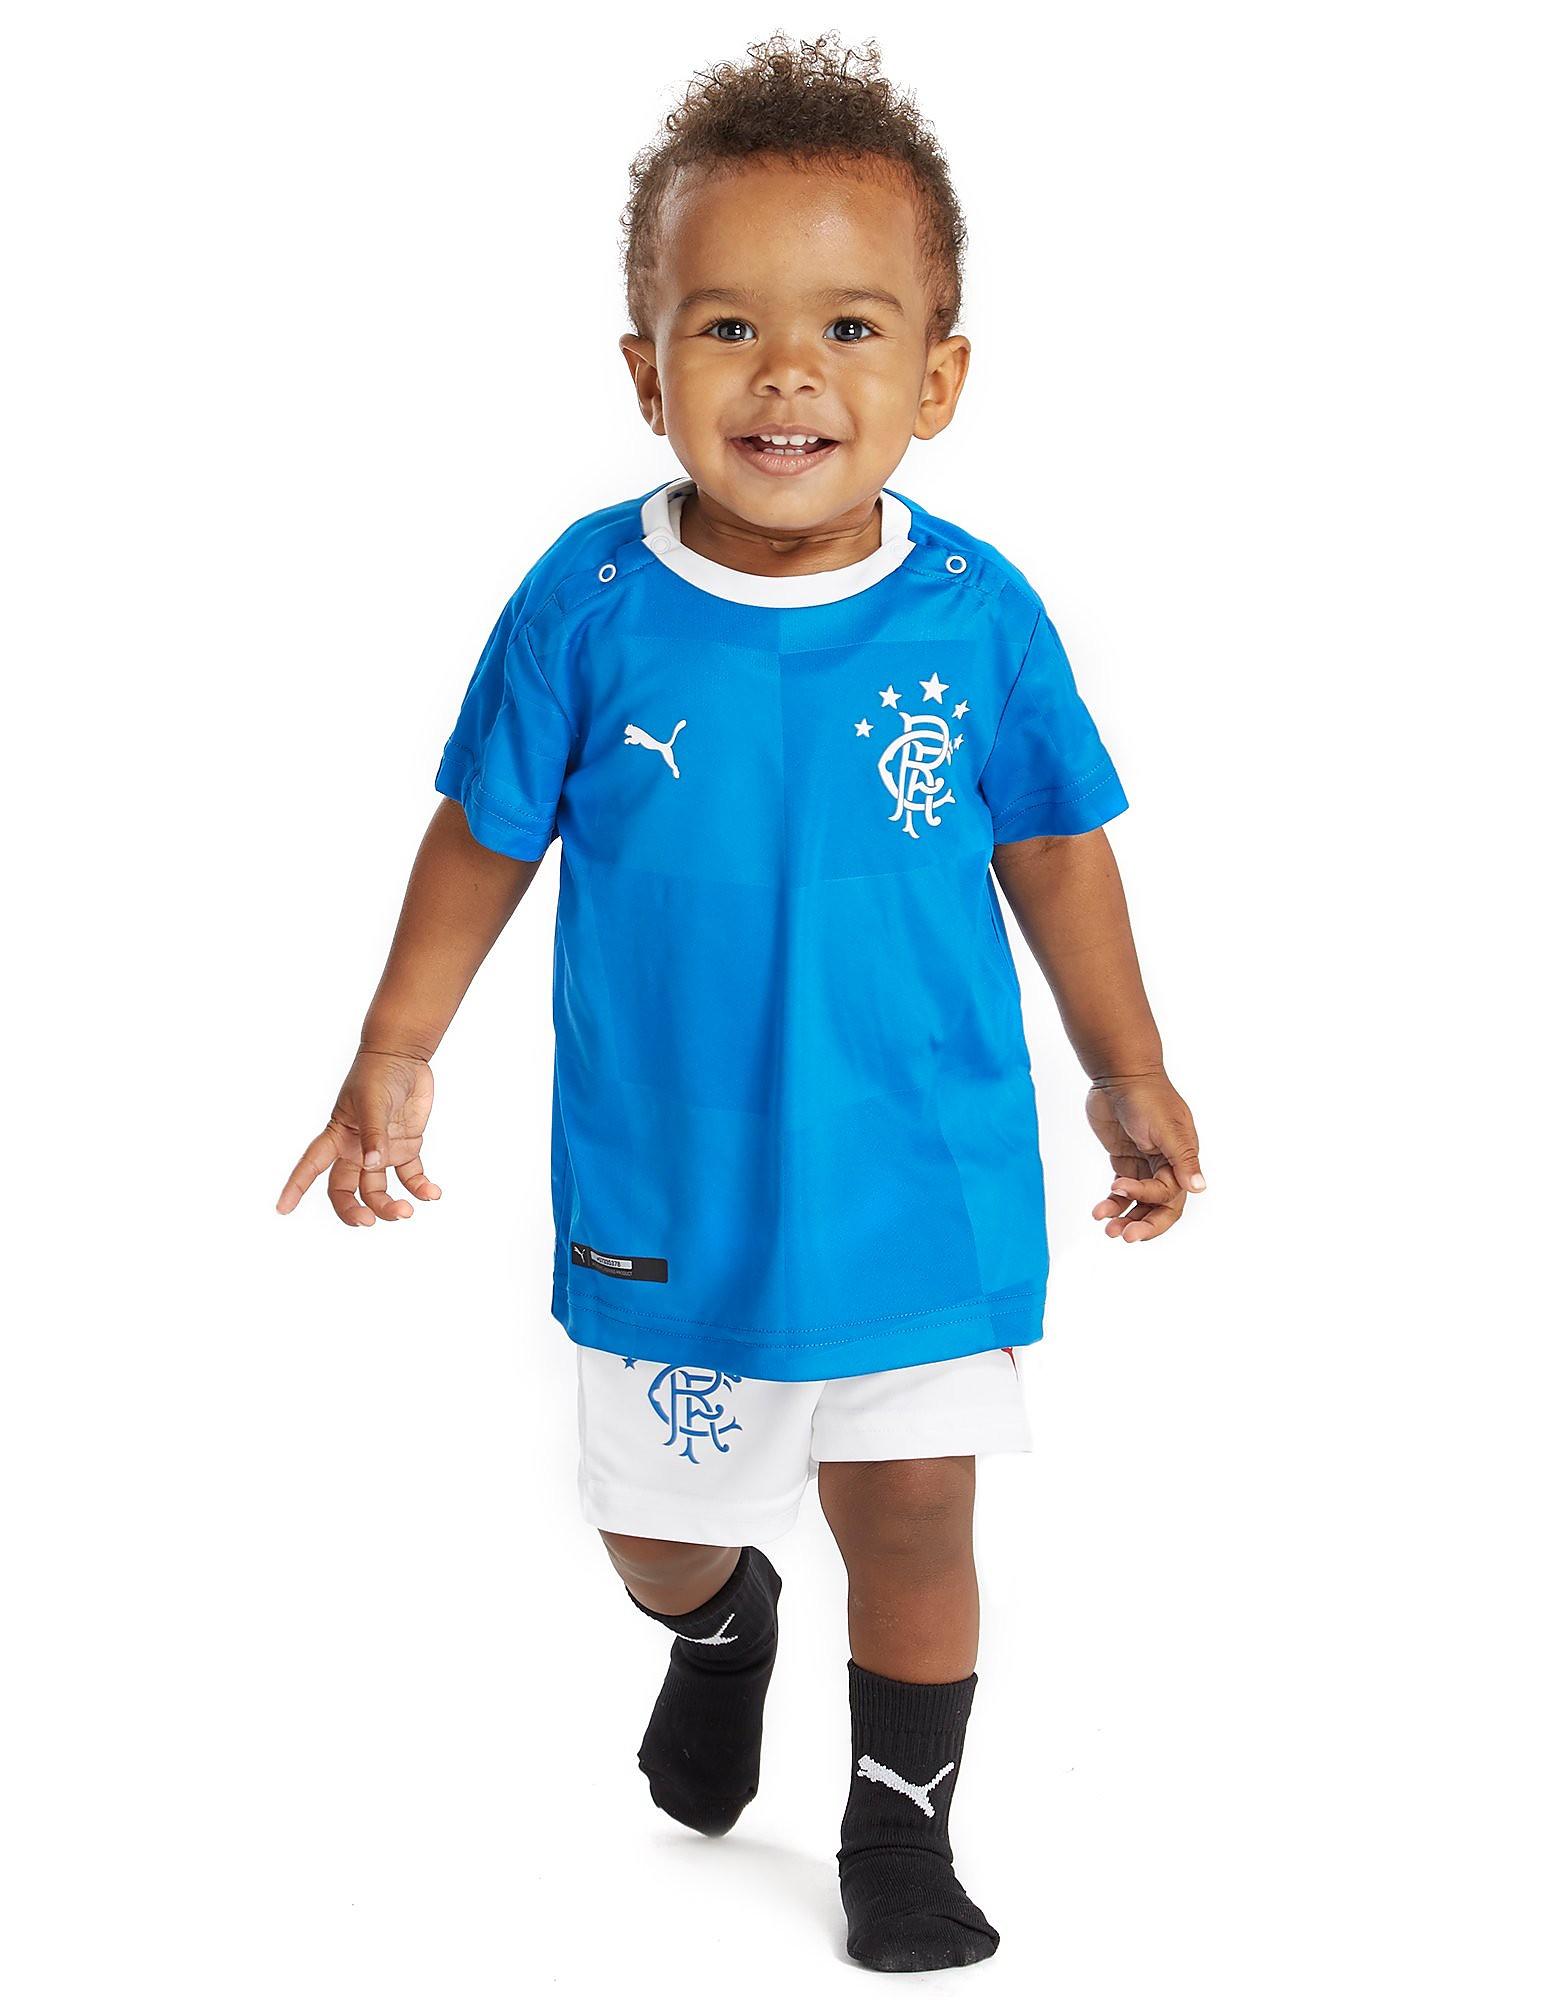 PUMA Rangers FC 2016/17 Home Kit Infant